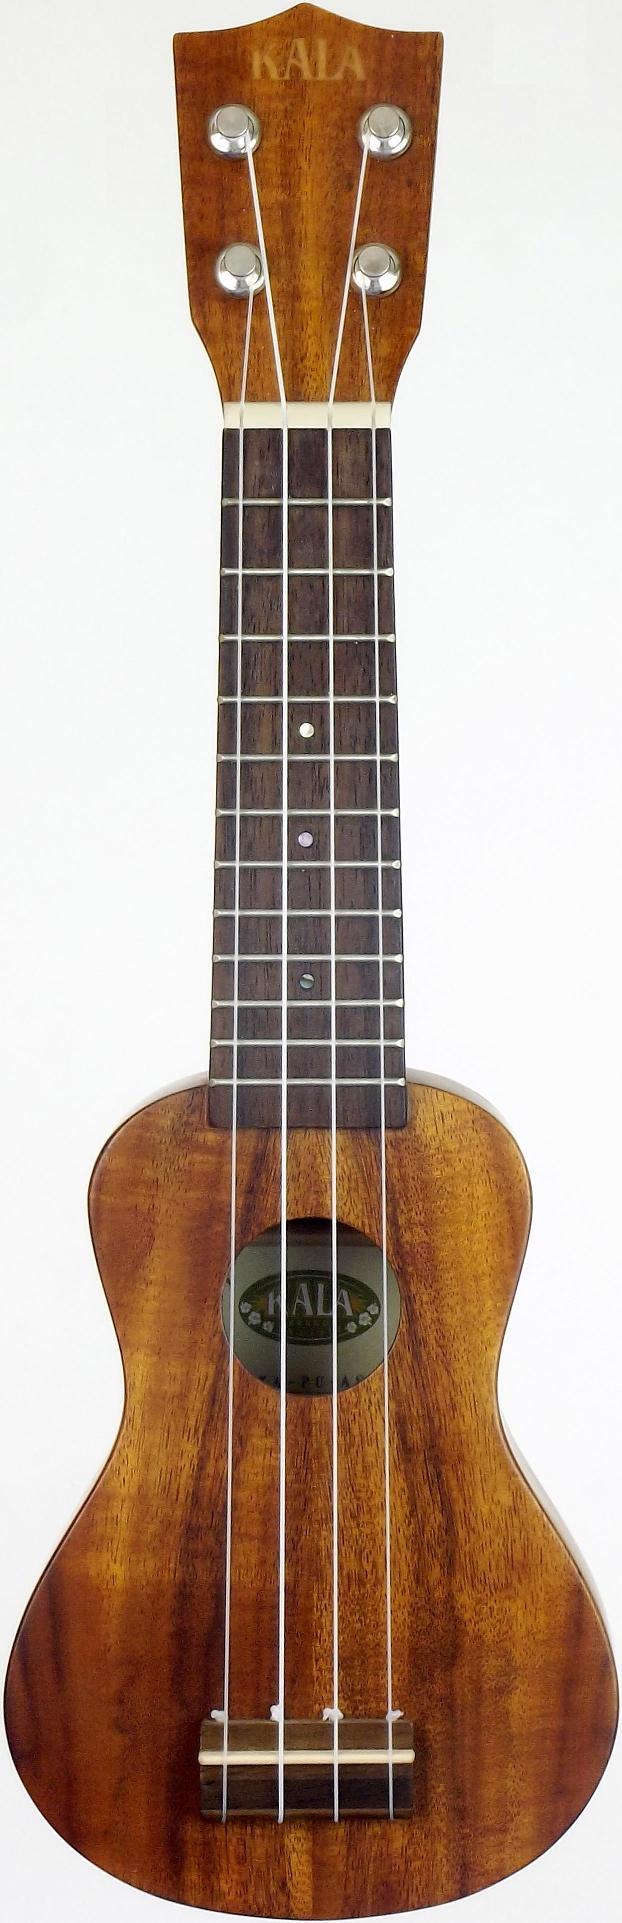 Pin on Strings III